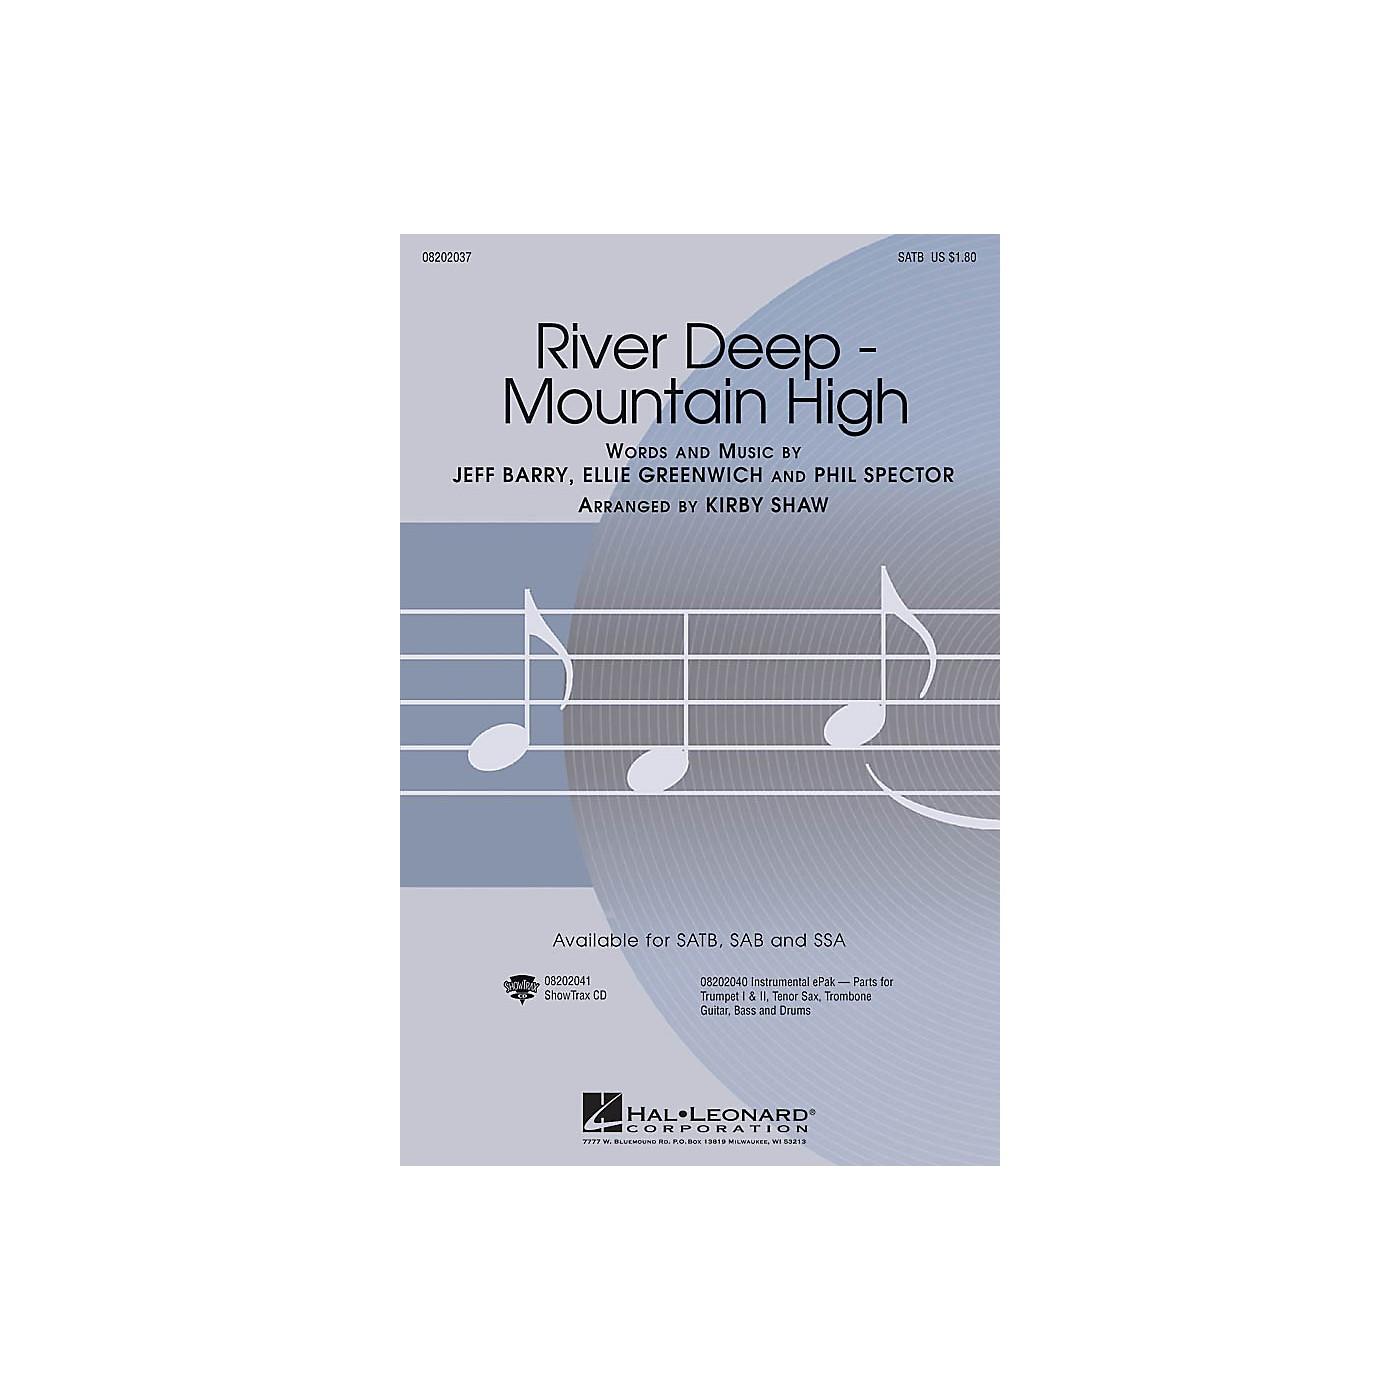 Hal Leonard River Deep - Mountain High SATB by Tina Turner arranged by Kirby Shaw thumbnail